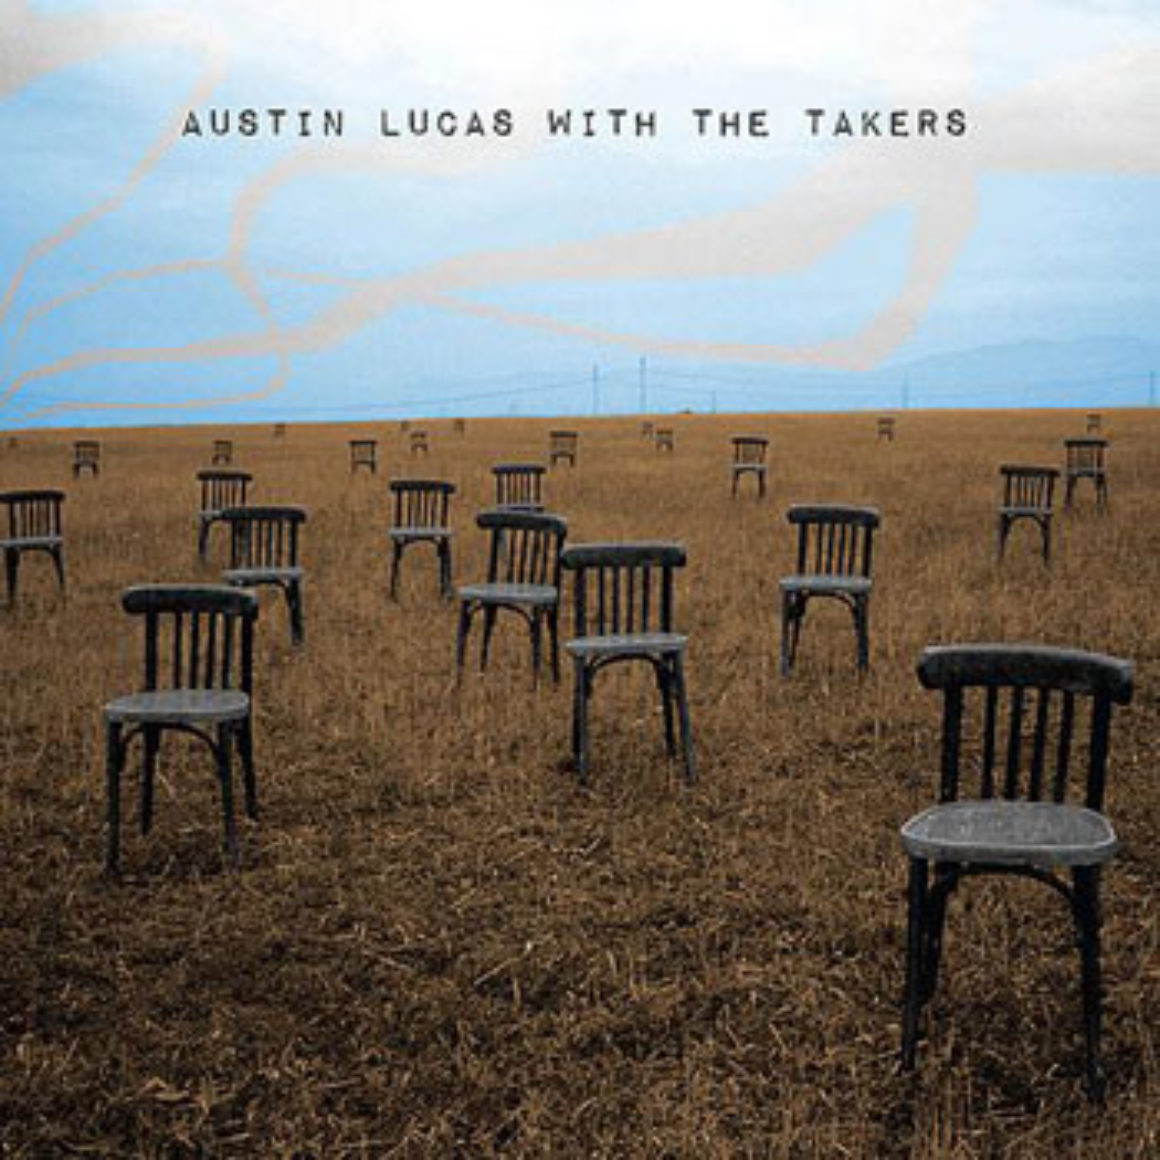 Austin Lucas with The Taker - Splits